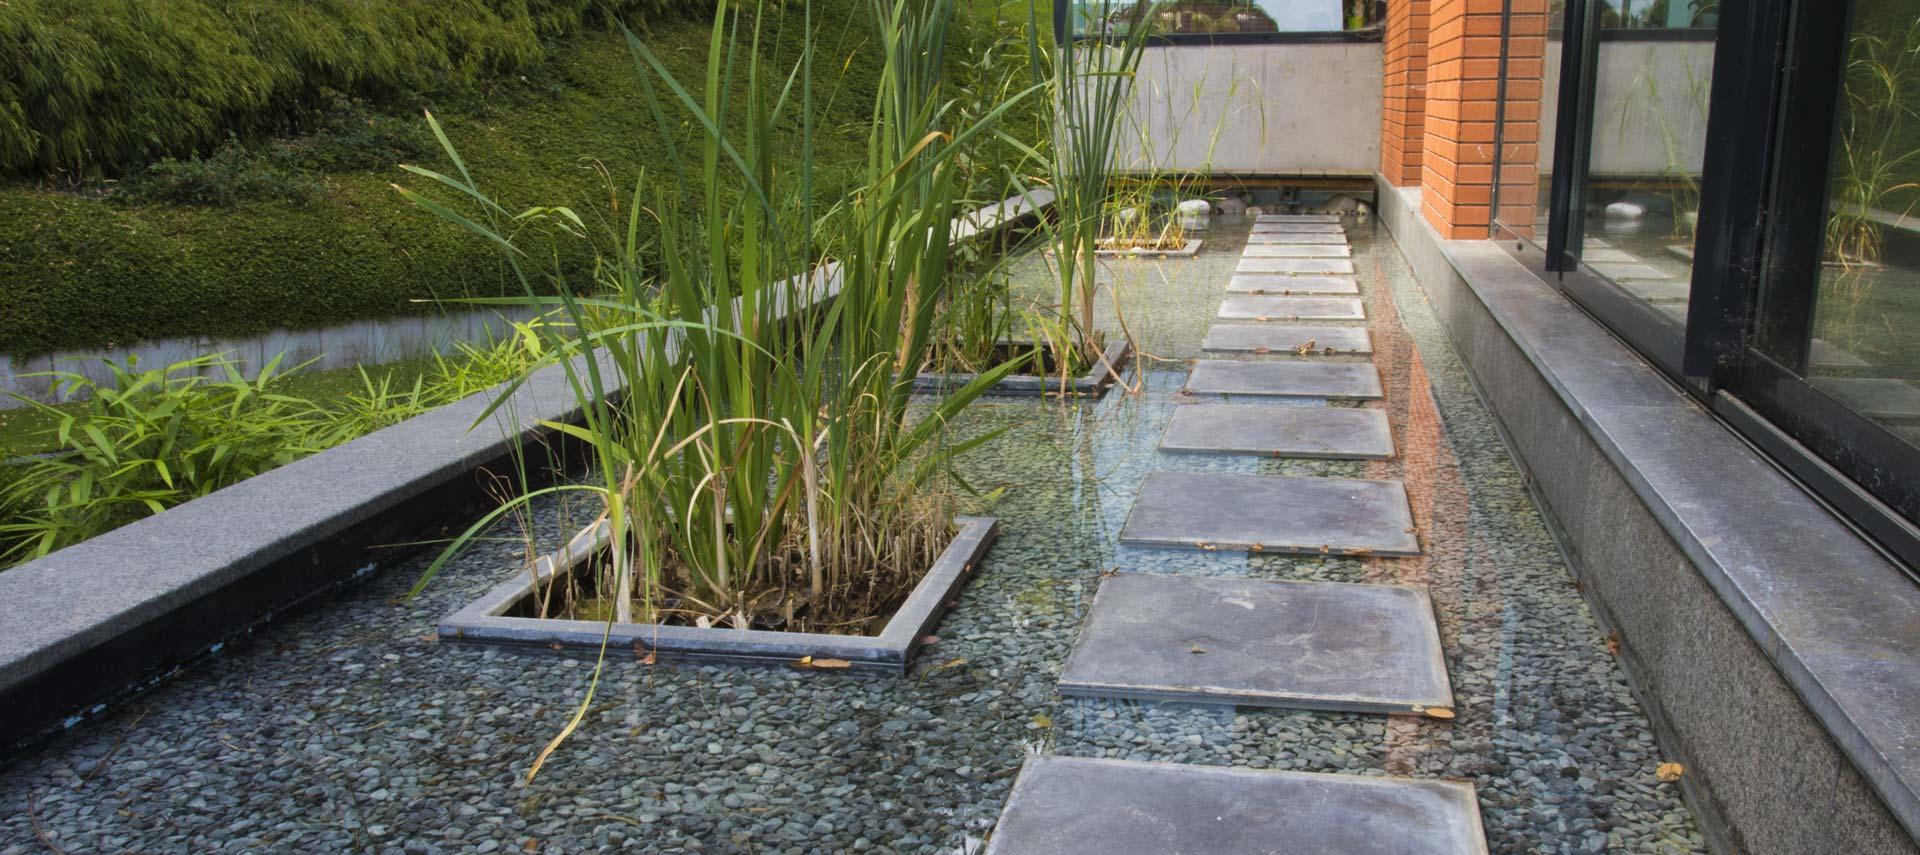 merlet-paysagiste-allée-de-jardin-long